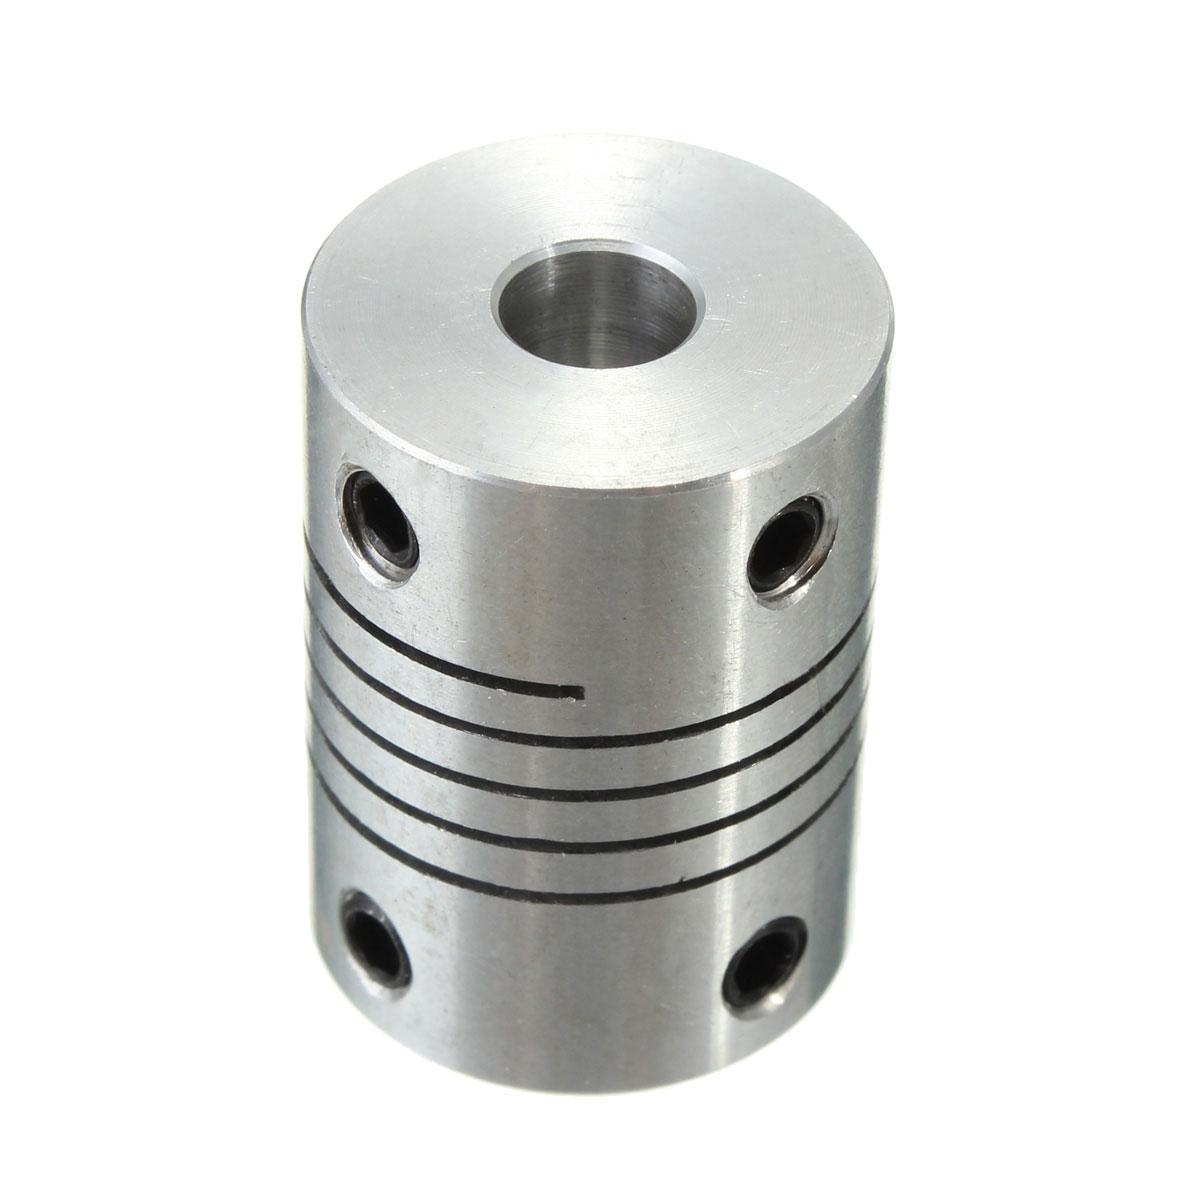 Flexible shaft coupling rigid cnc stepper motor coupler for Stepper motor shaft coupling coupler